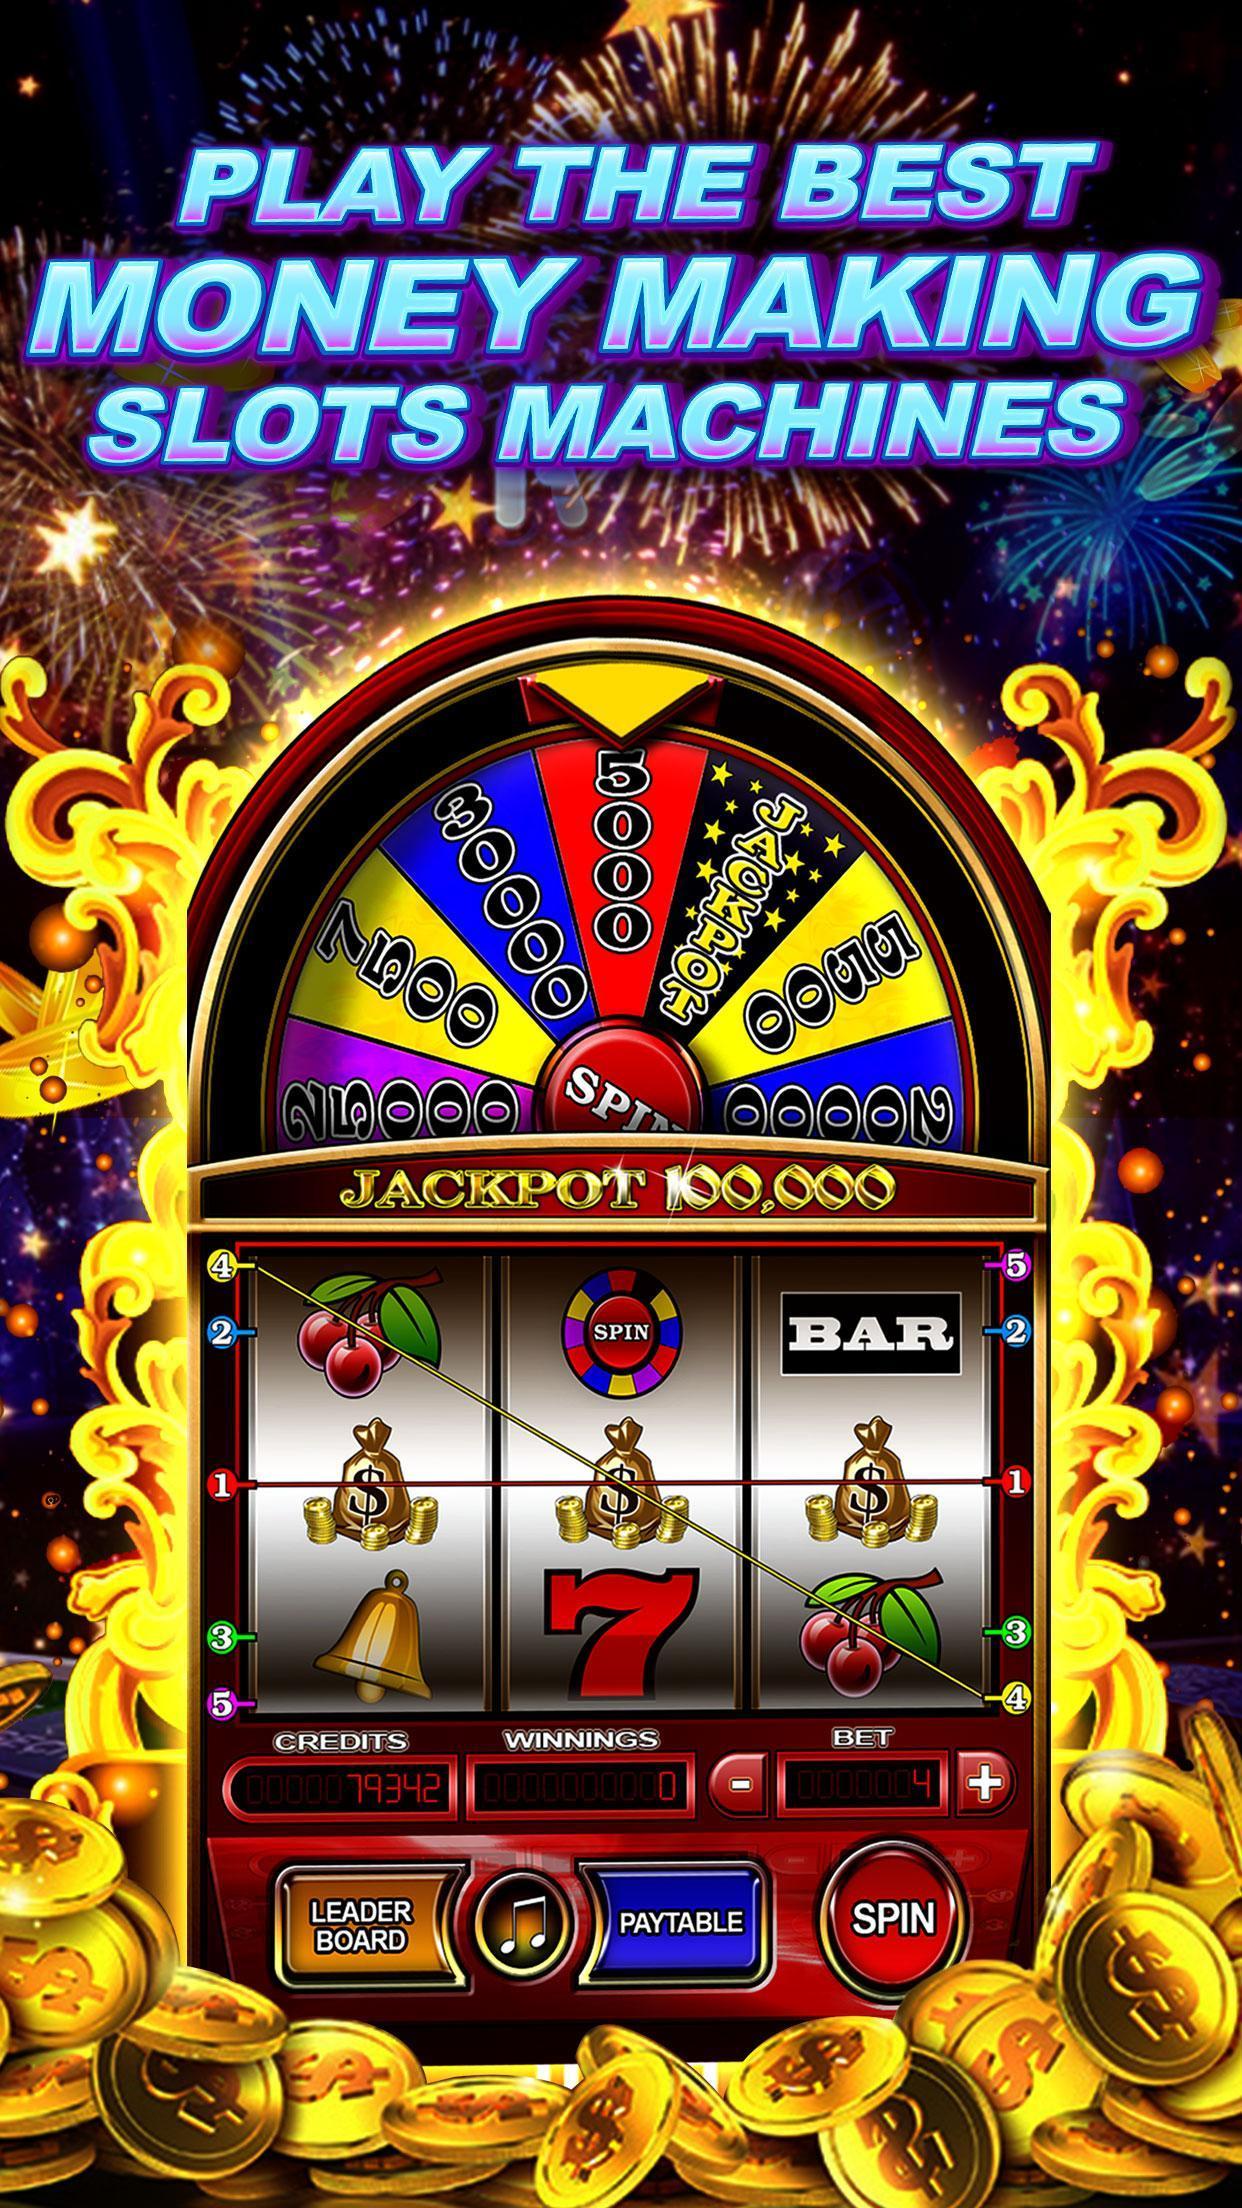 Big Wheel No Registration Slot Machine Review